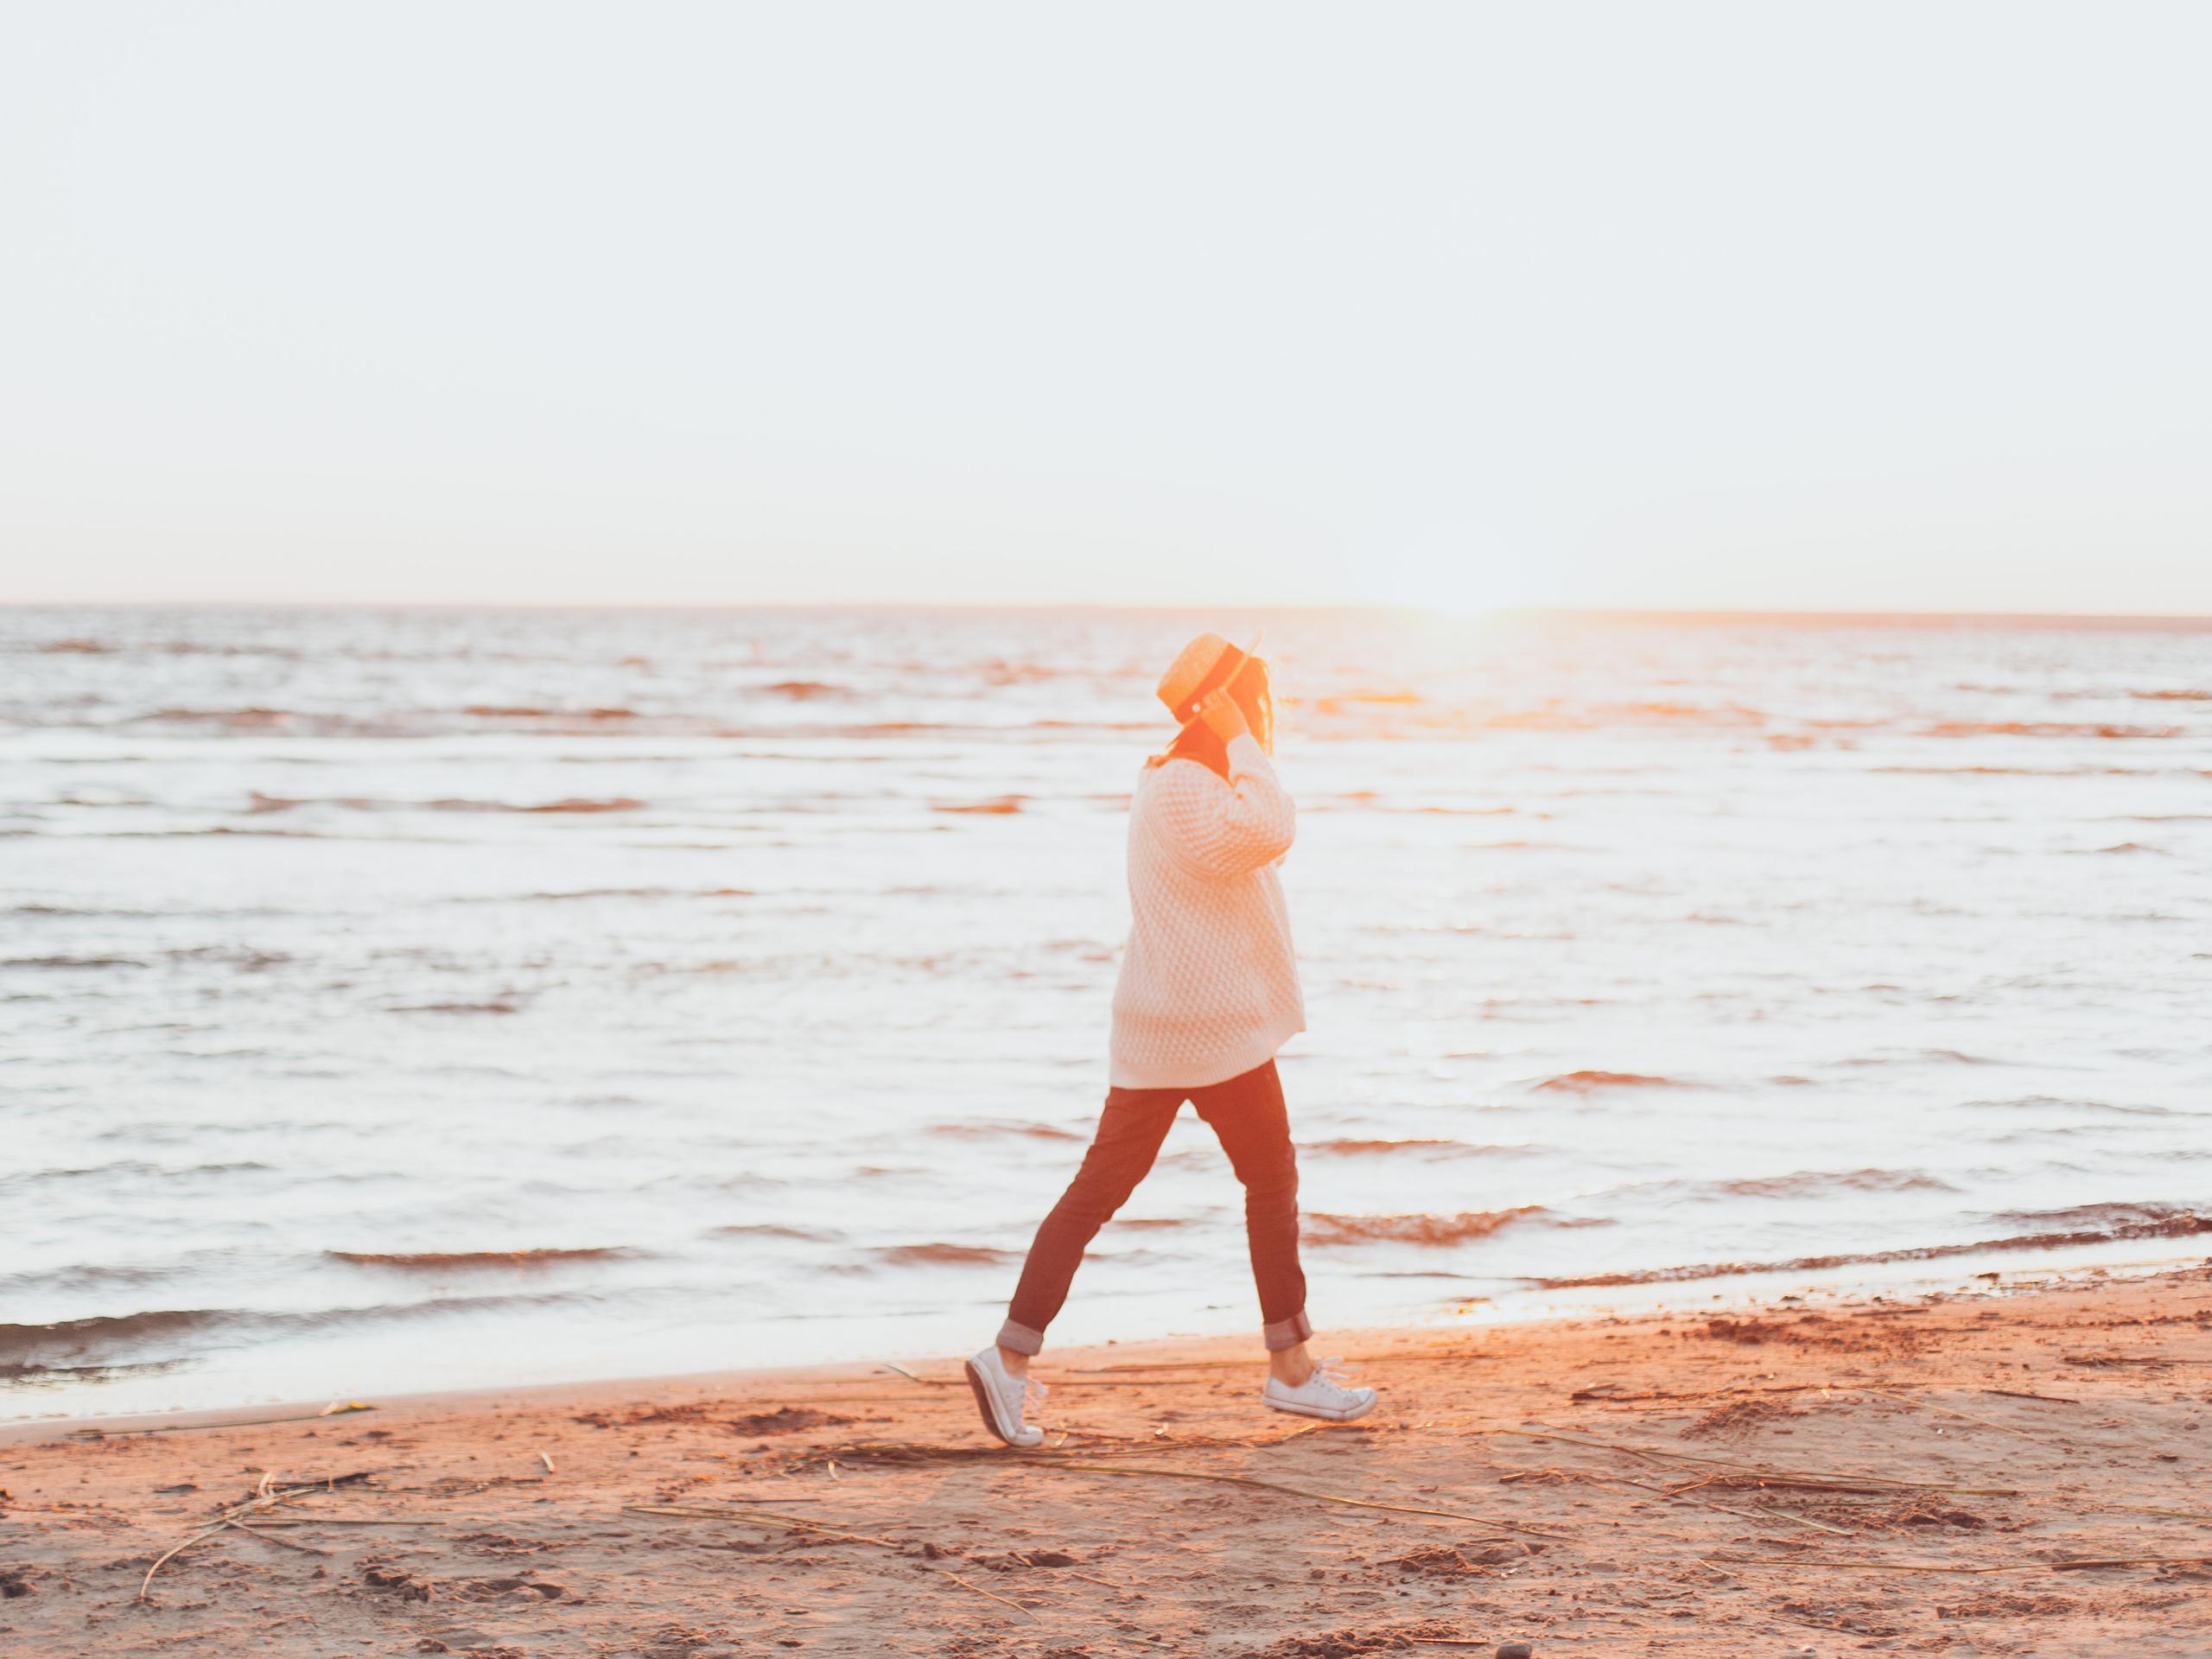 Girl walks on the beach in Tofino